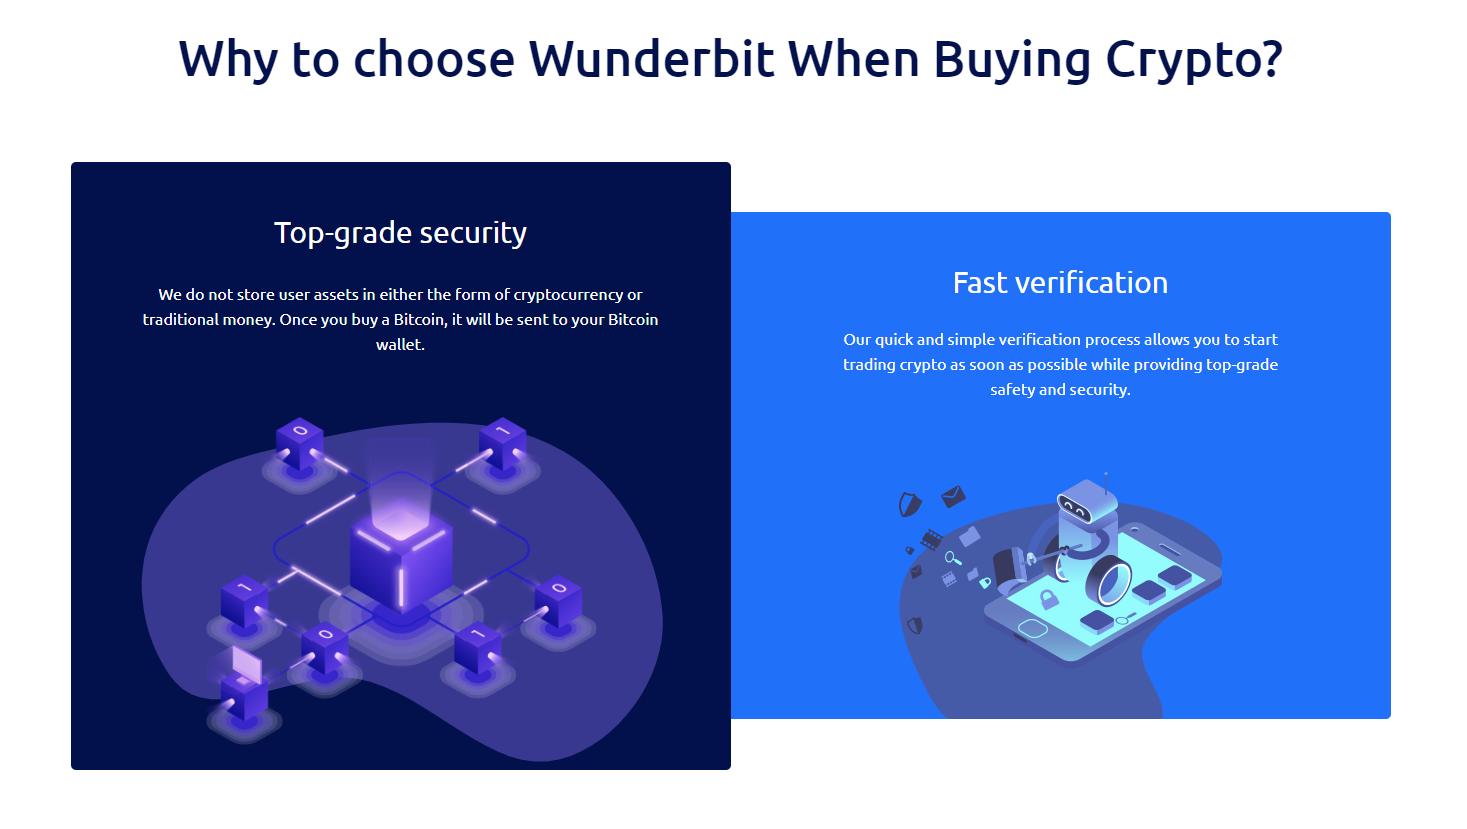 WunderBit Why